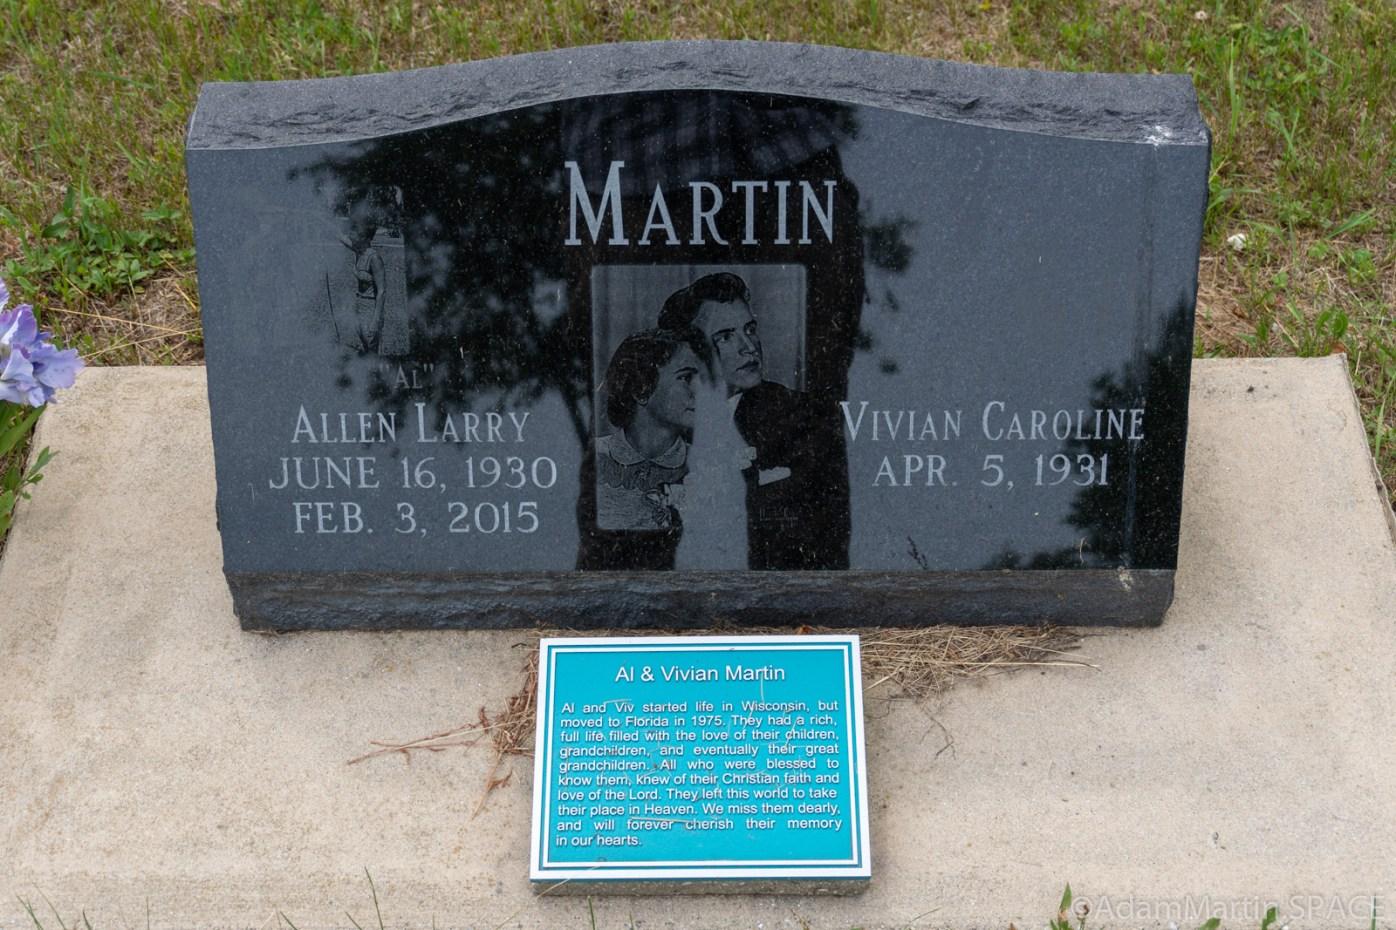 Martin Cemetery - Allen Larry Martin headstone